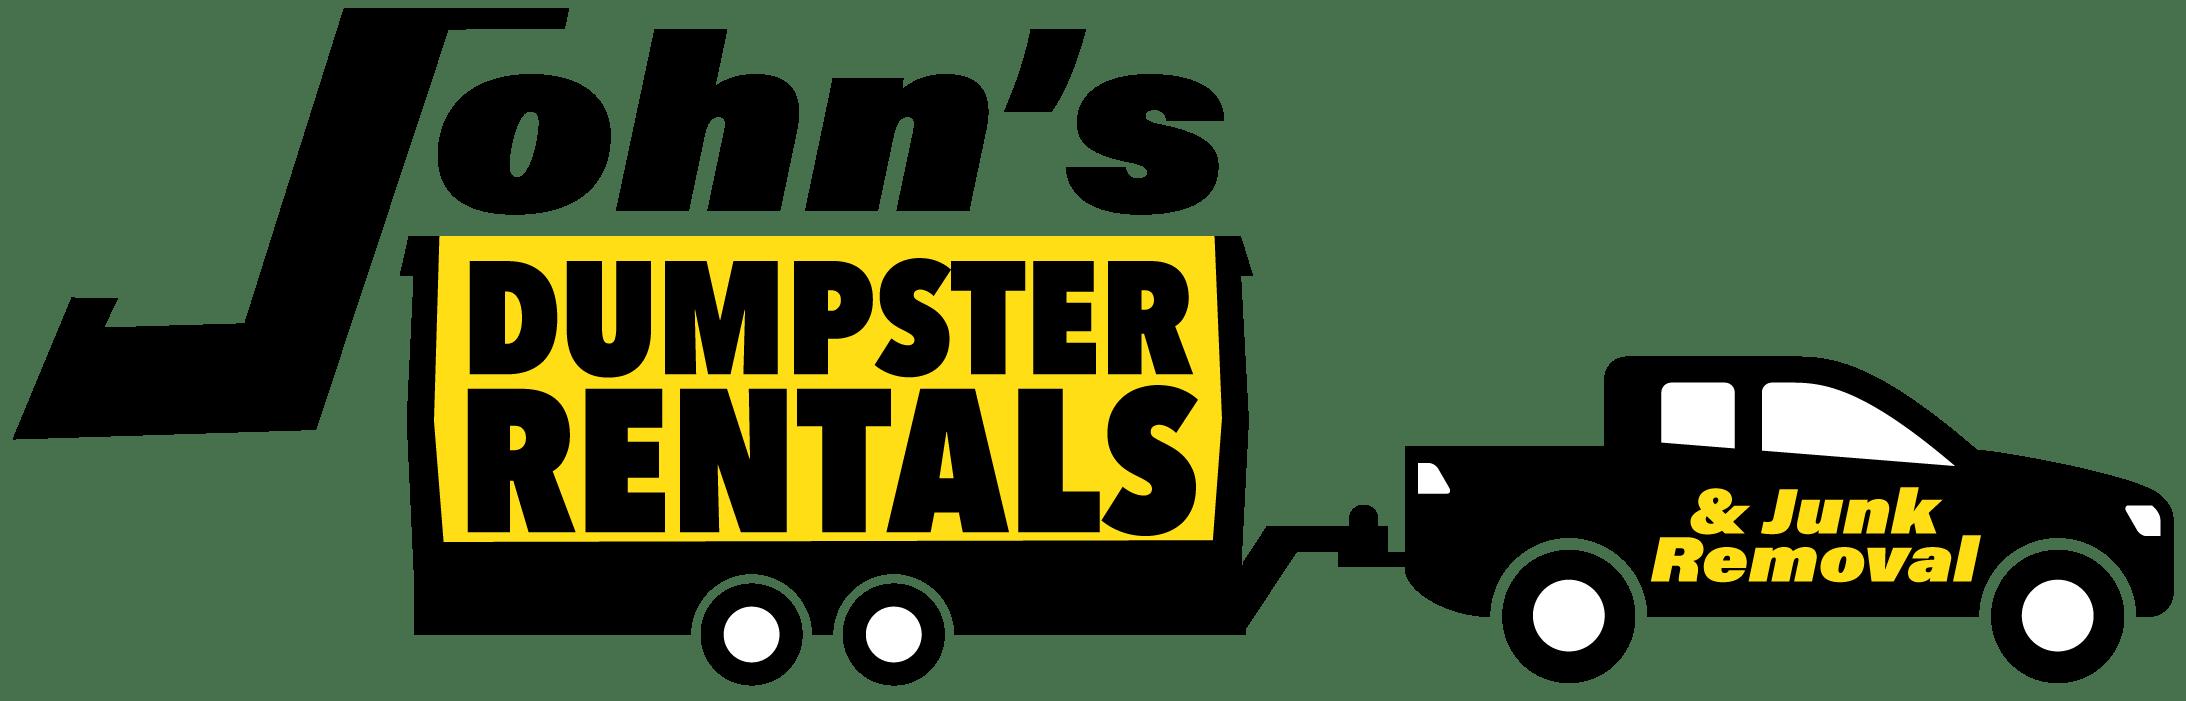 John's Dumpster Rentals